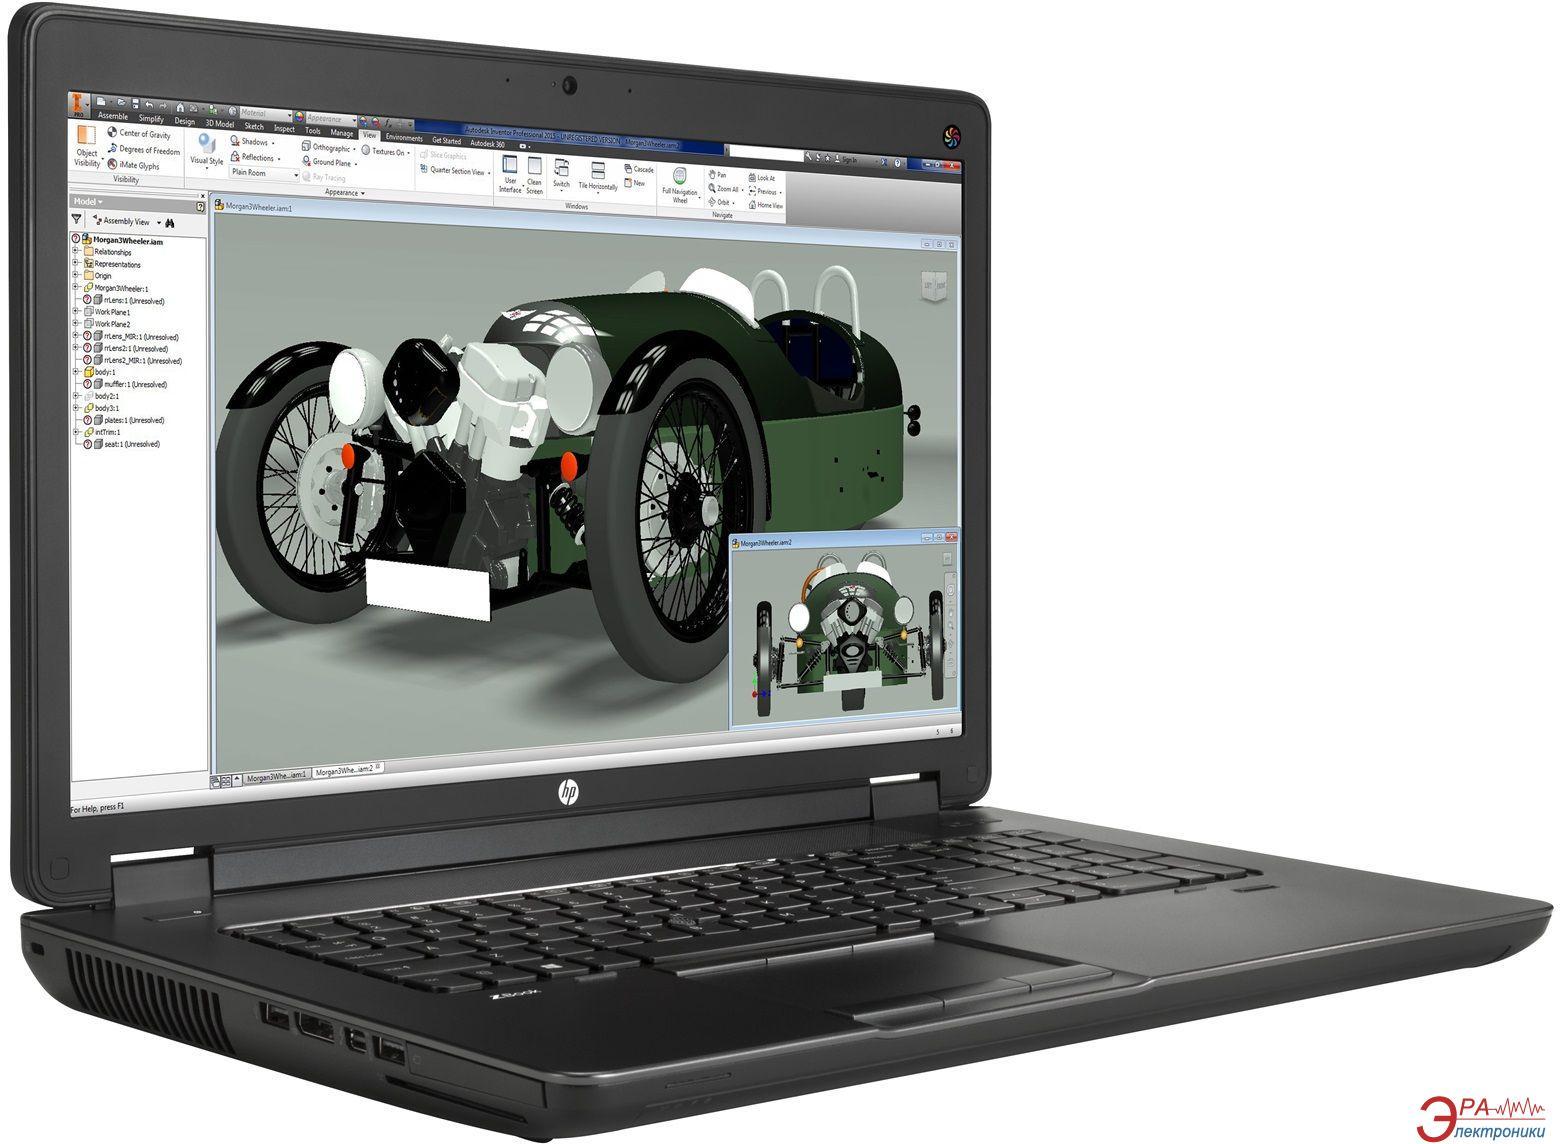 Ноутбук HP Zbook 17/1 G2 (G6Z41AV) Black 17,3